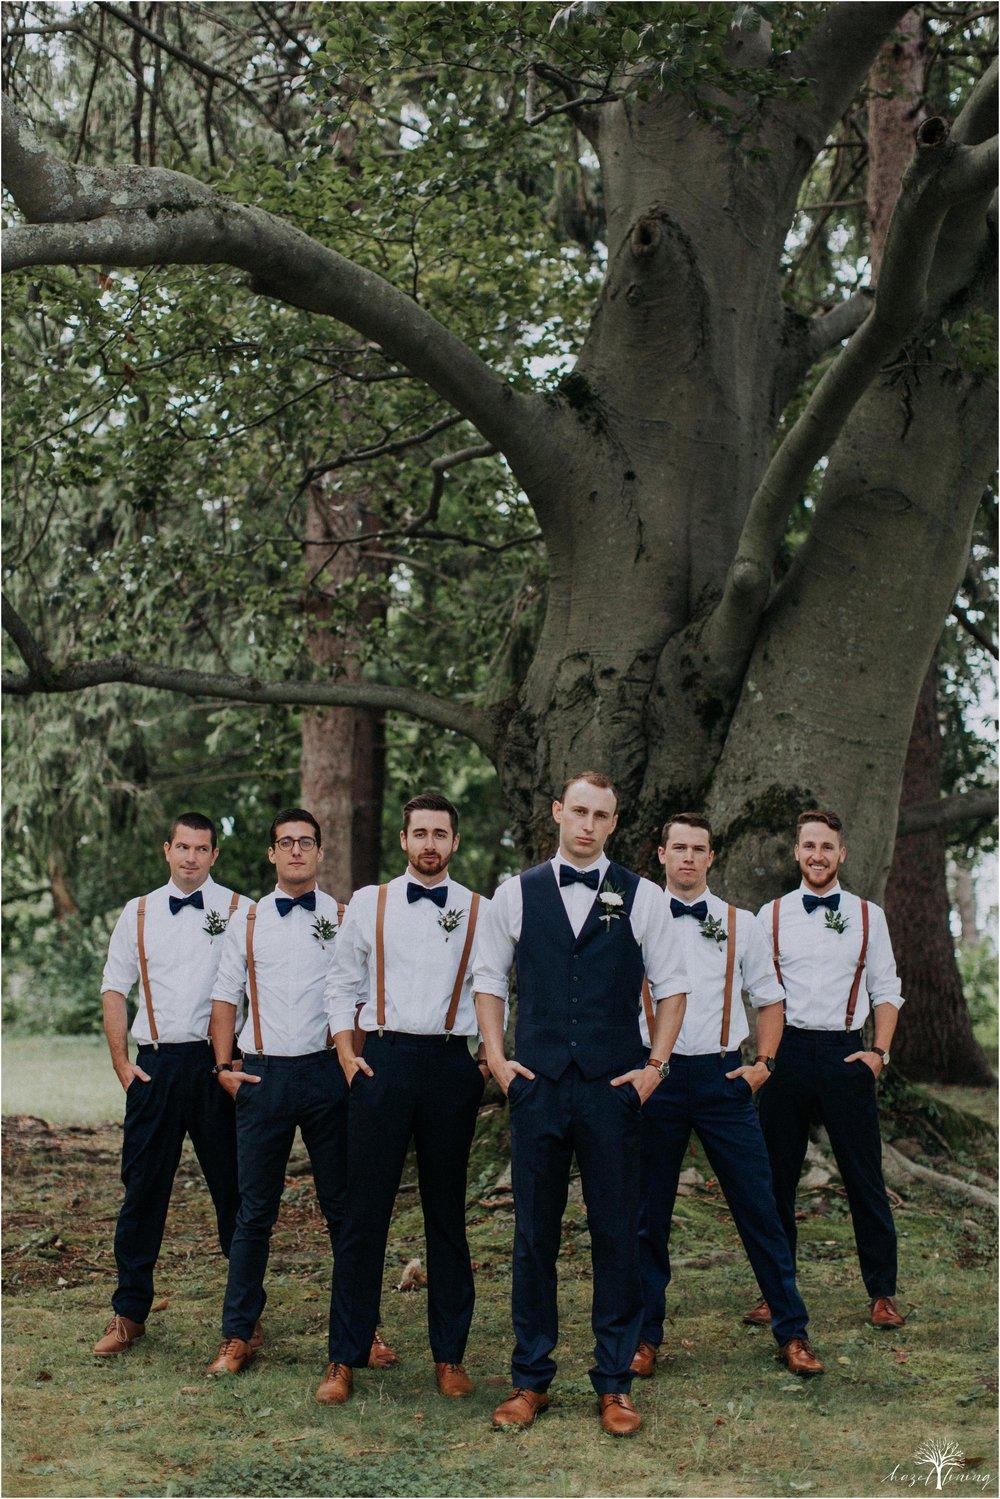 mariah-kreyling-samuel-sherratt-sherrattwiththeworld-peirce-farm-at-witch-hill-boston-massachusetts-wedding-photography-hazel-lining-travel-wedding-elopement-photography_0064.jpg